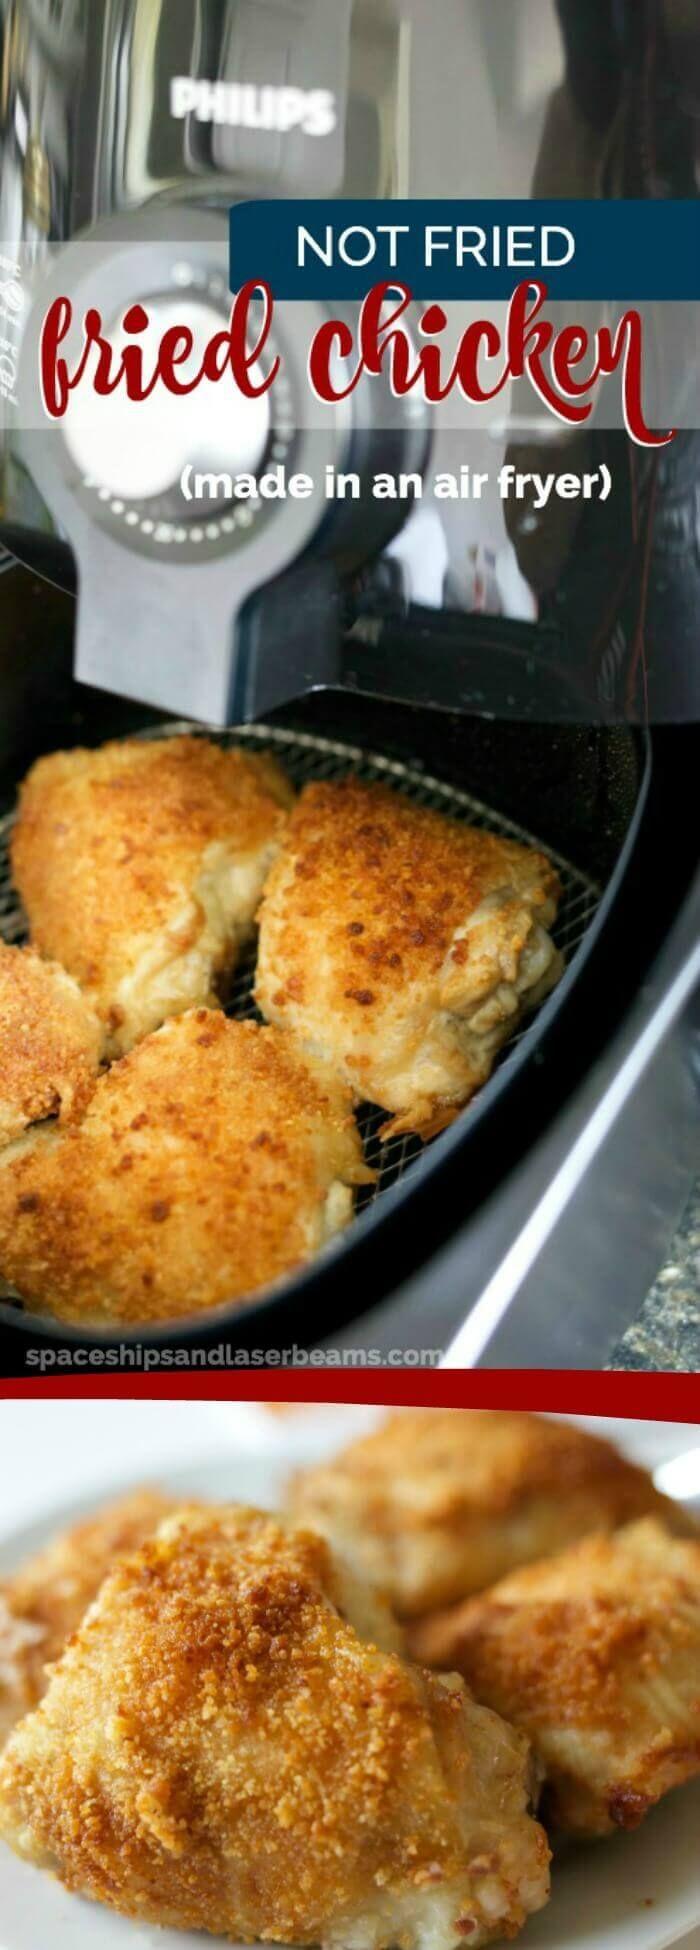 (Not Fried) Fried Chicken Recipe